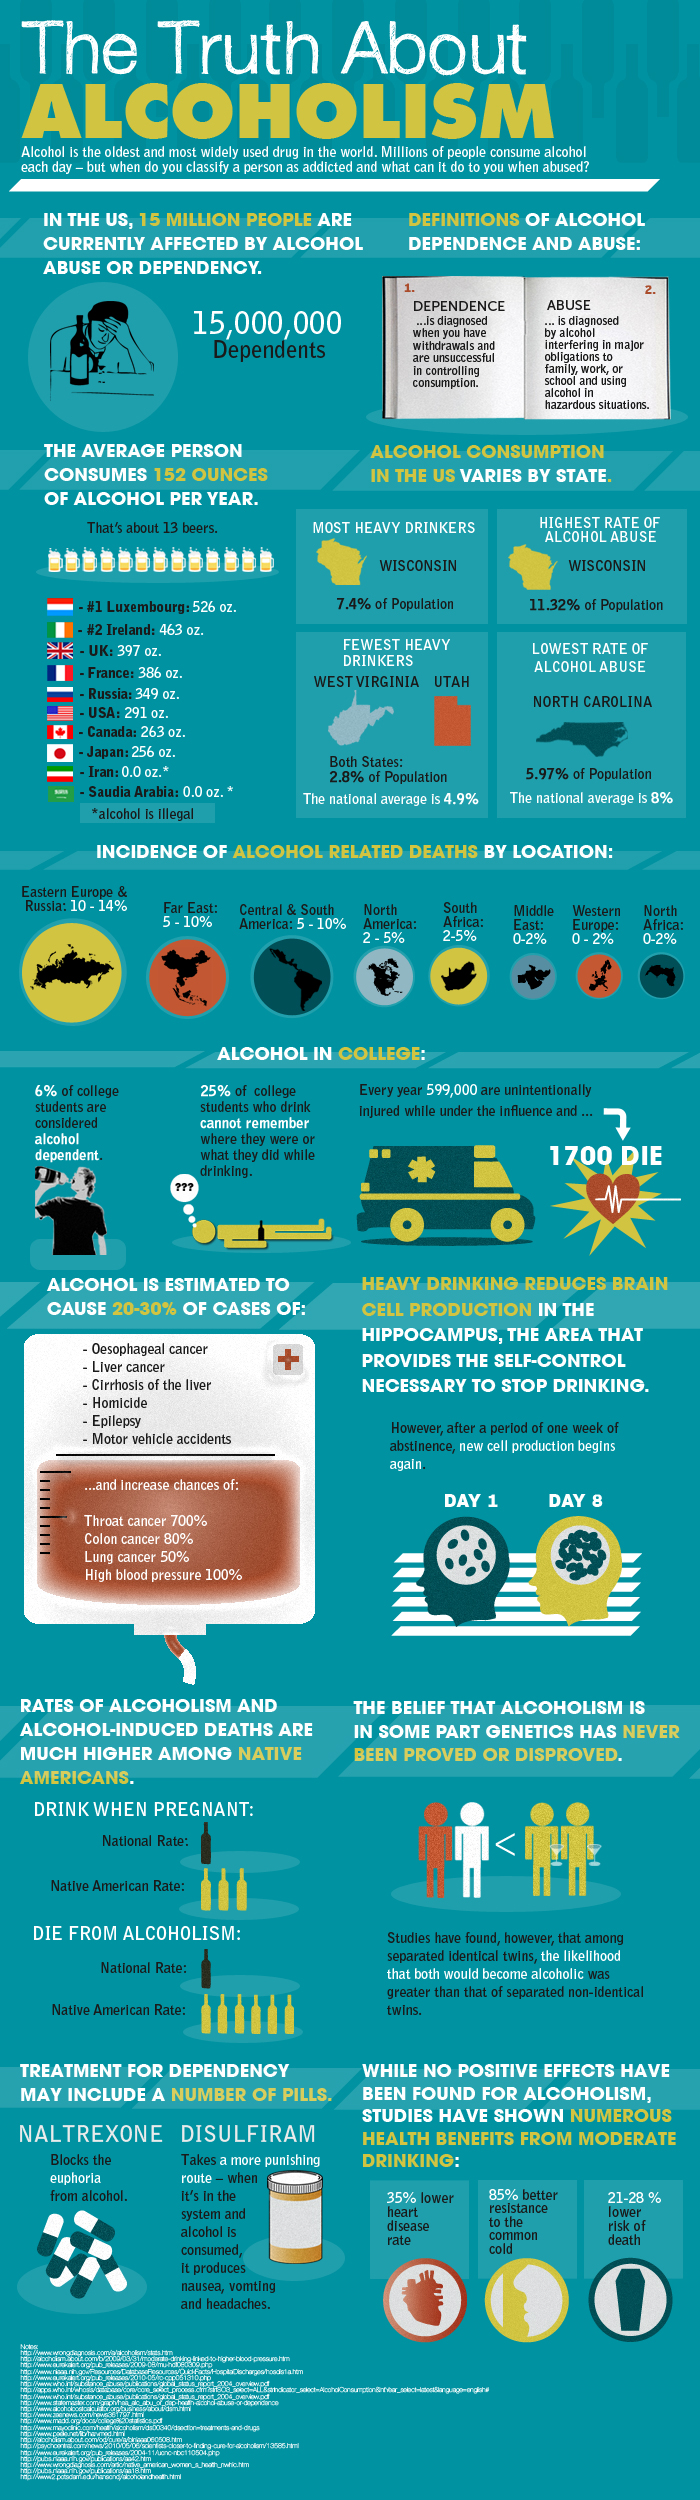 Alocholism Statistics and Trends